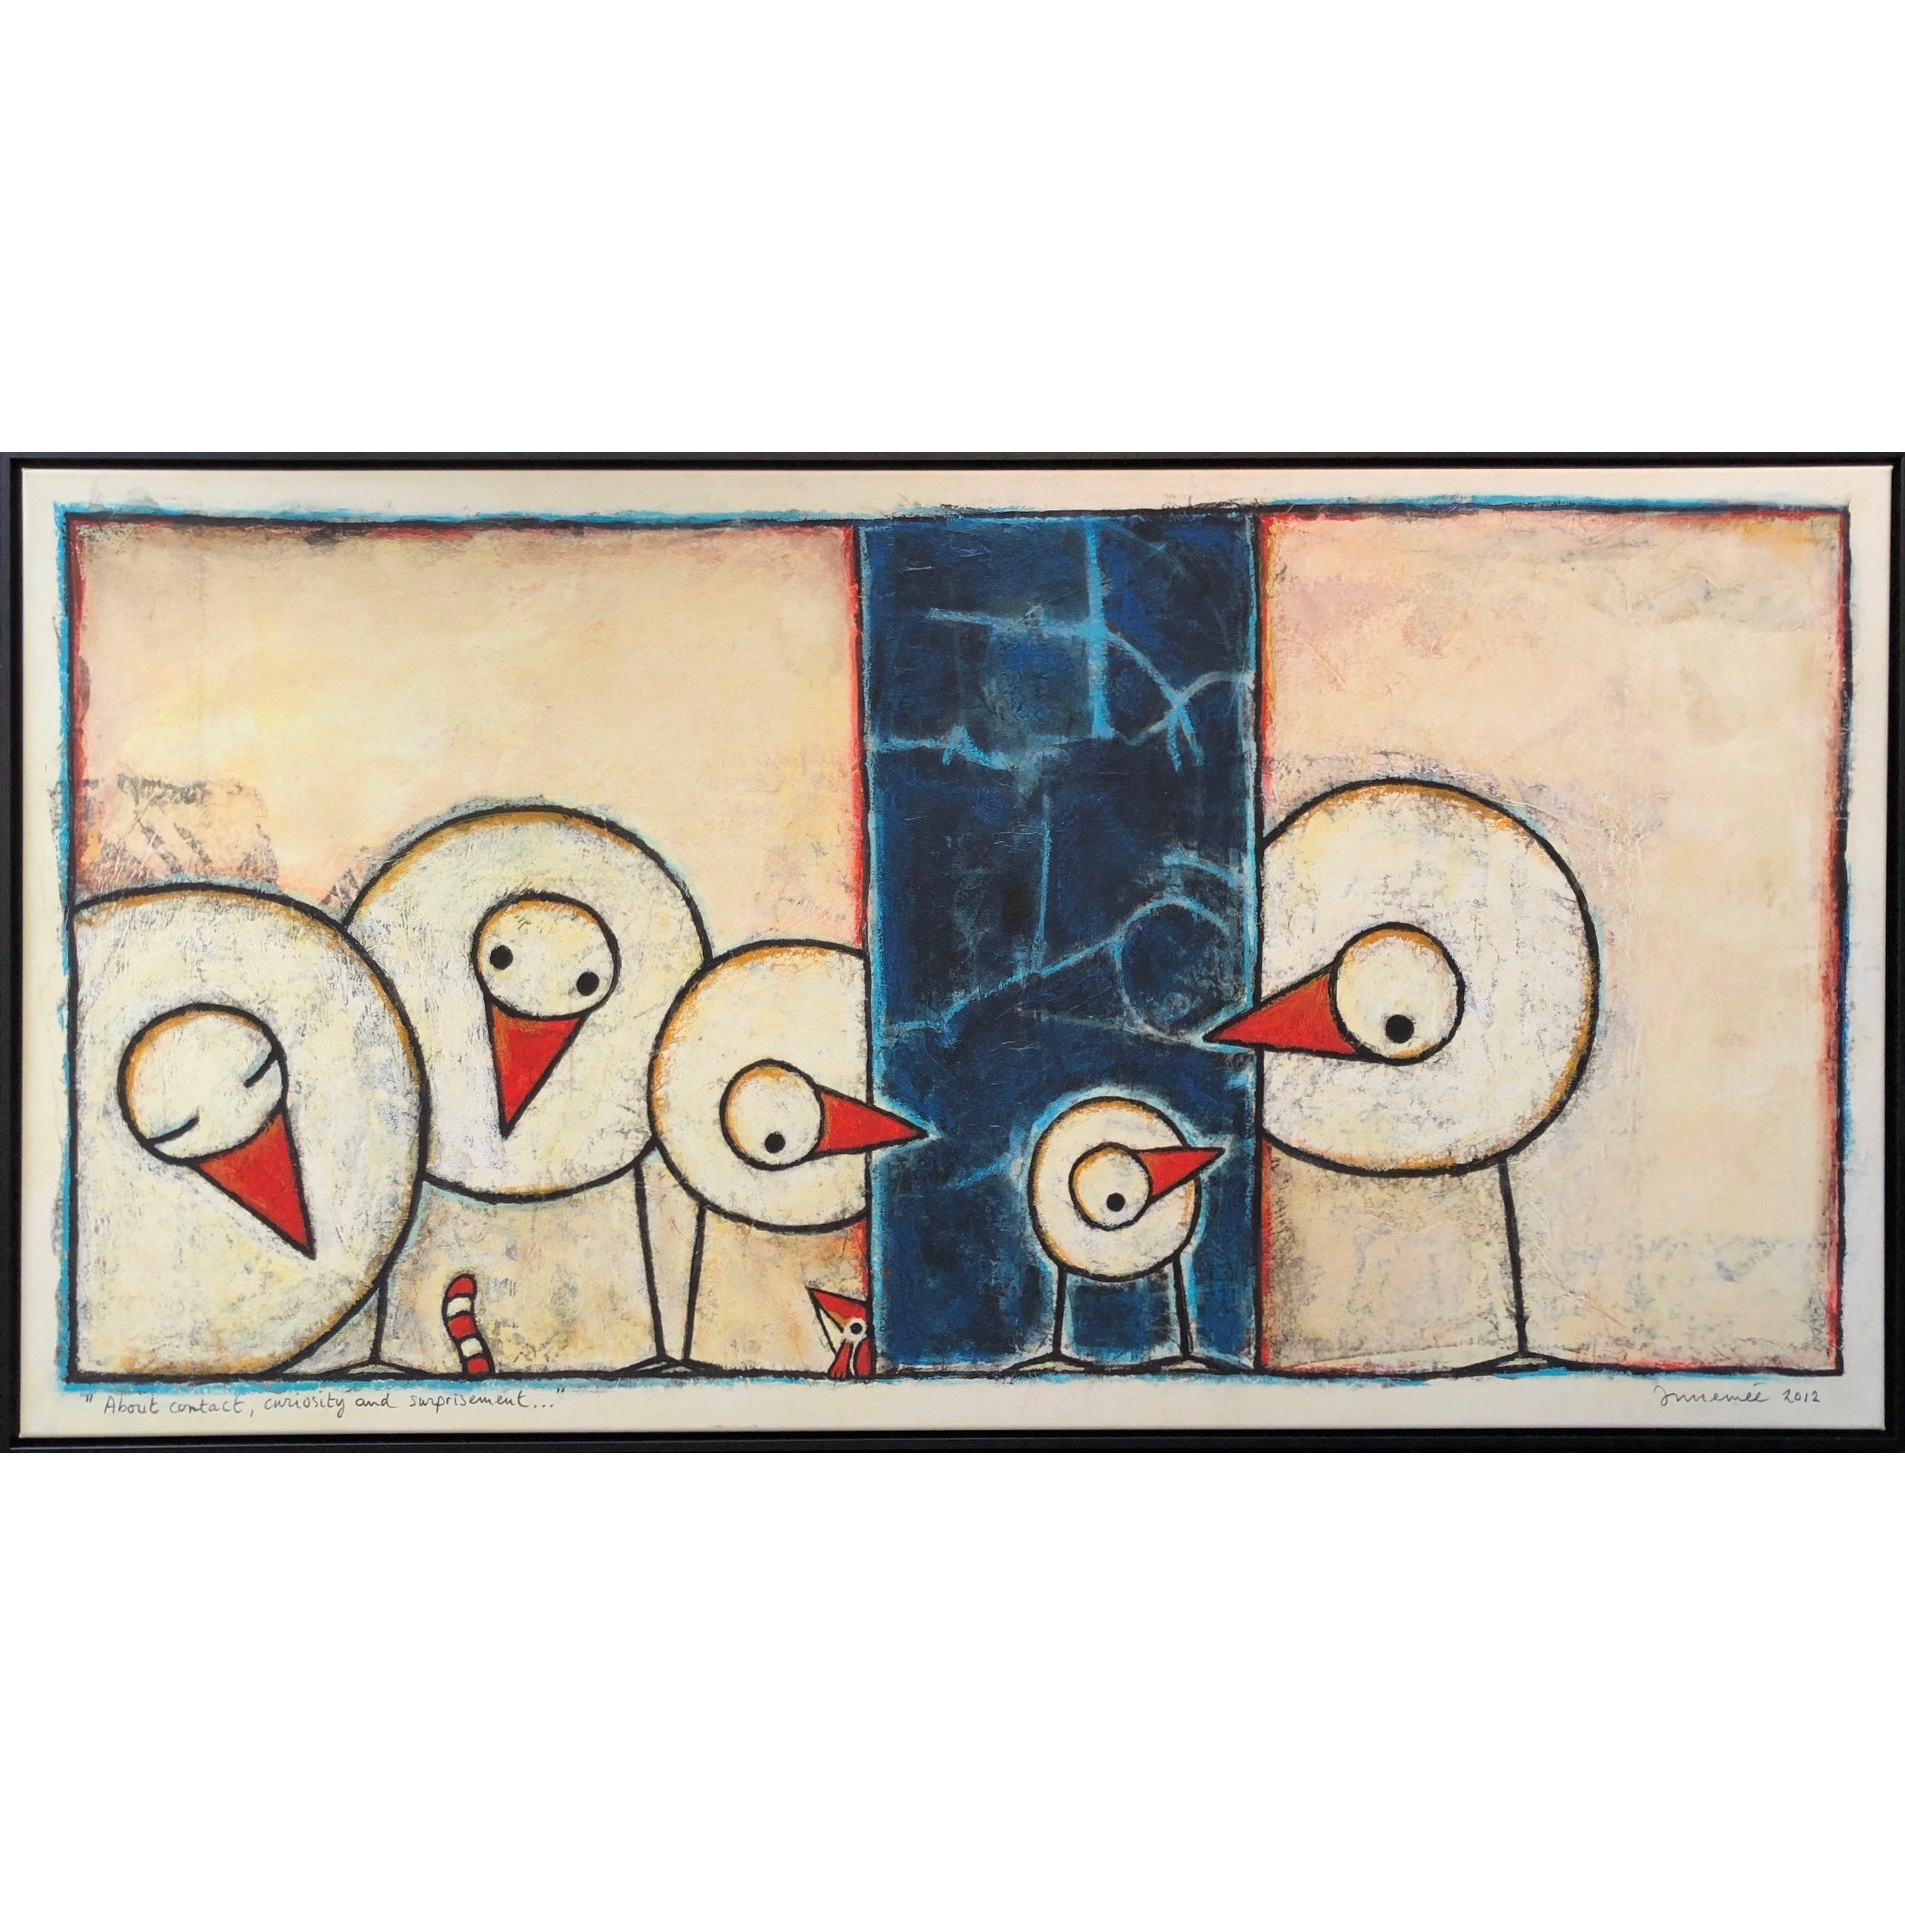 Hans Innemee Giclée 'About contact, curiosity and surprisement'